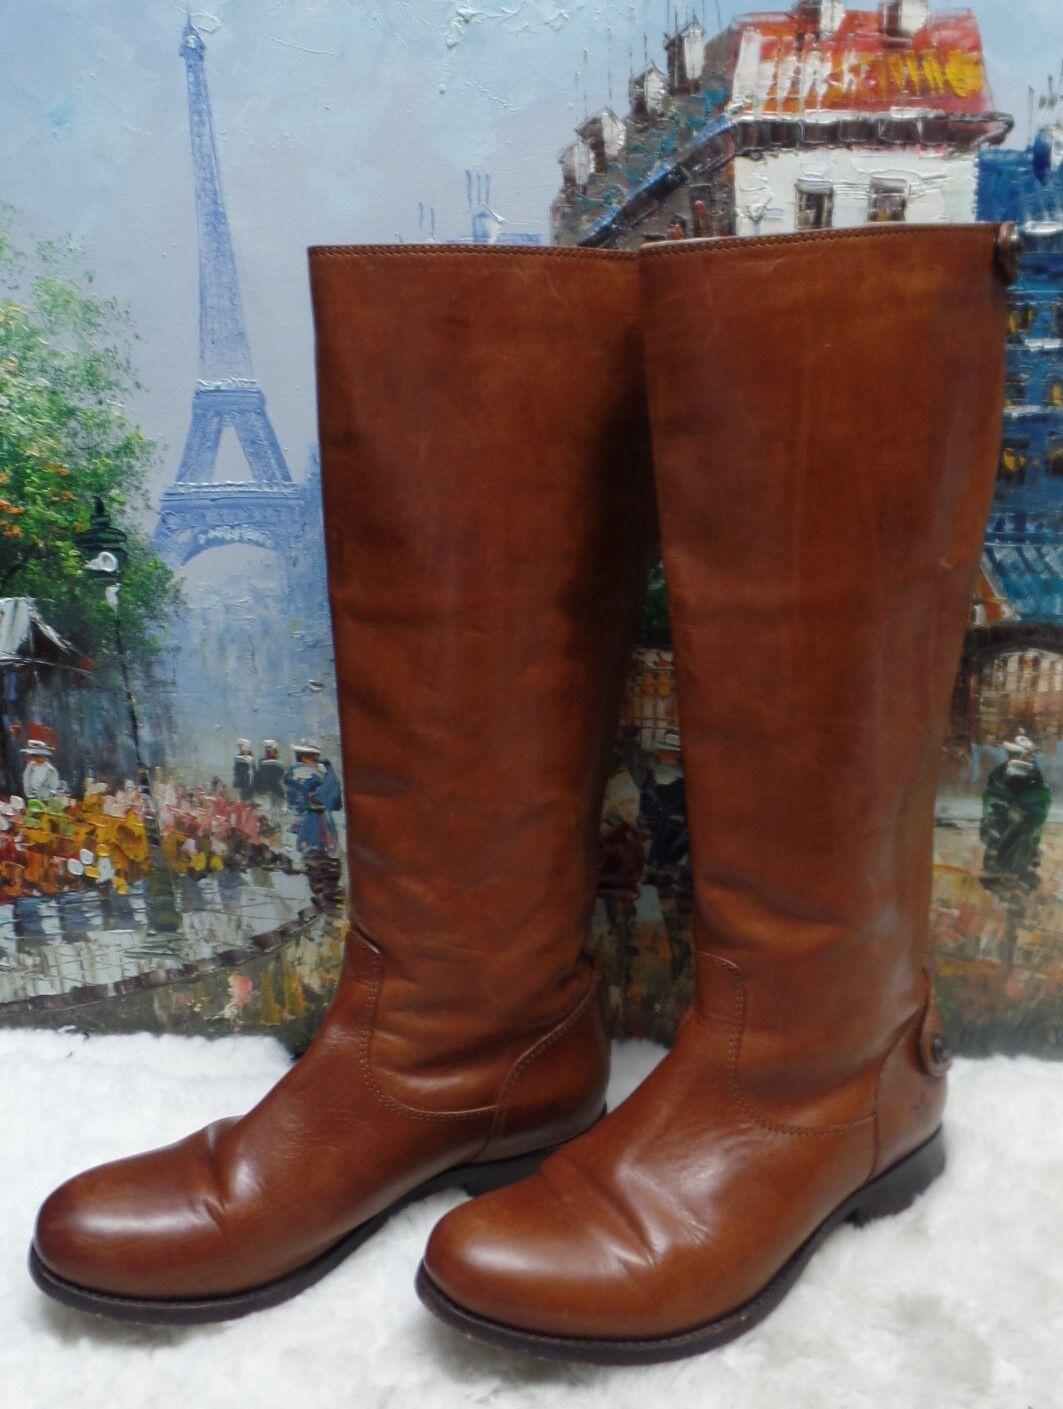 Frye Melissa Button Back Zip Boots - Size 6B - $388